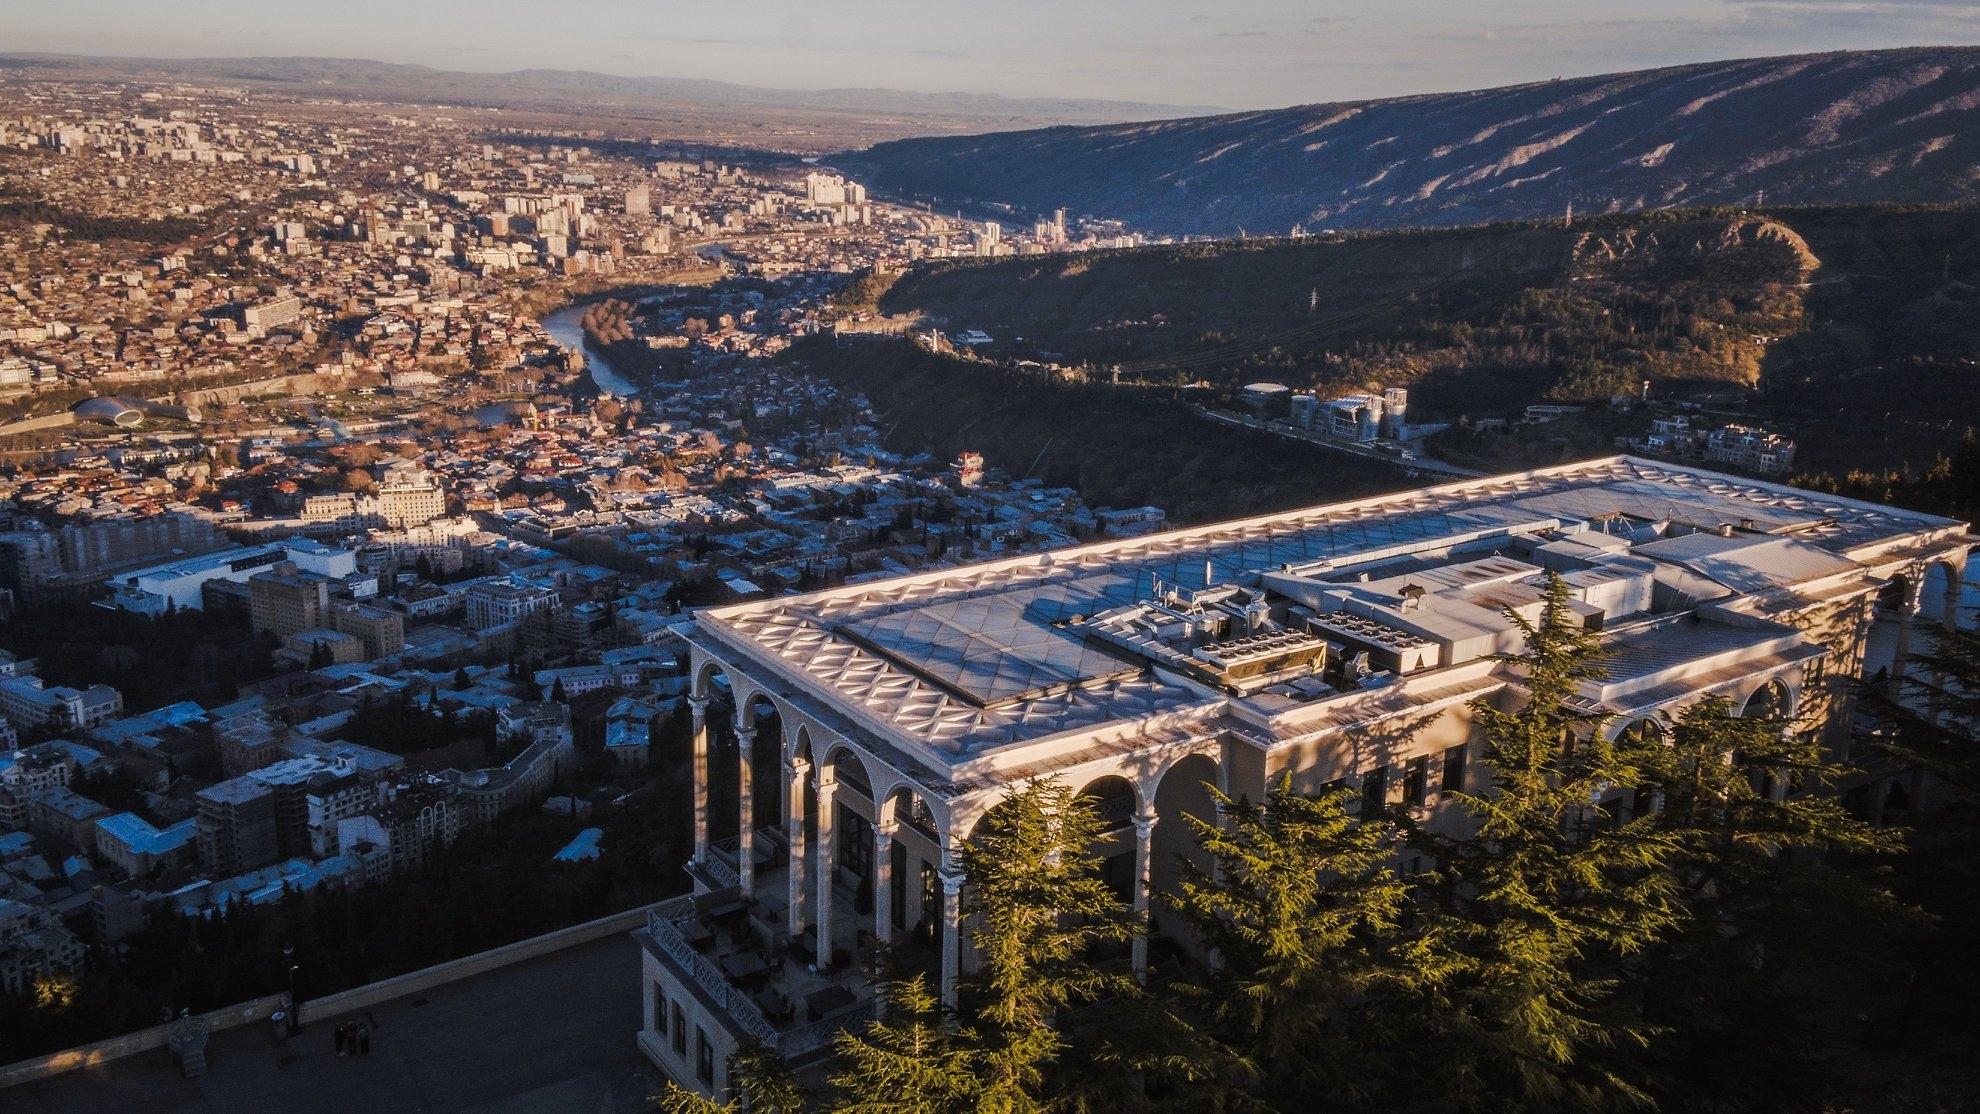 Restaurant Funicular in Tbilisi